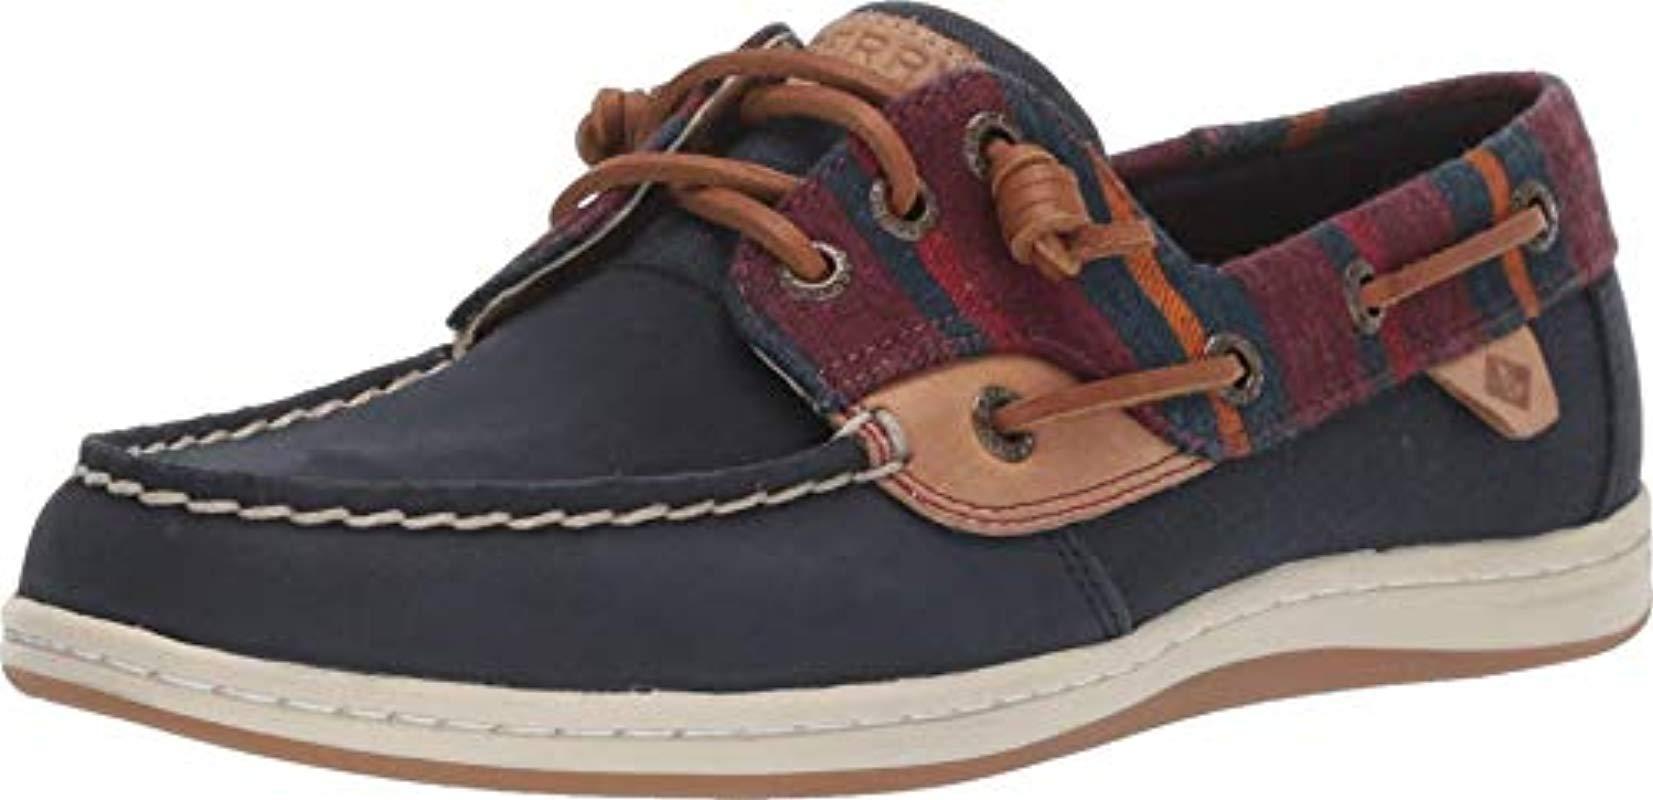 Songfish Varsity Wool Boat Shoes